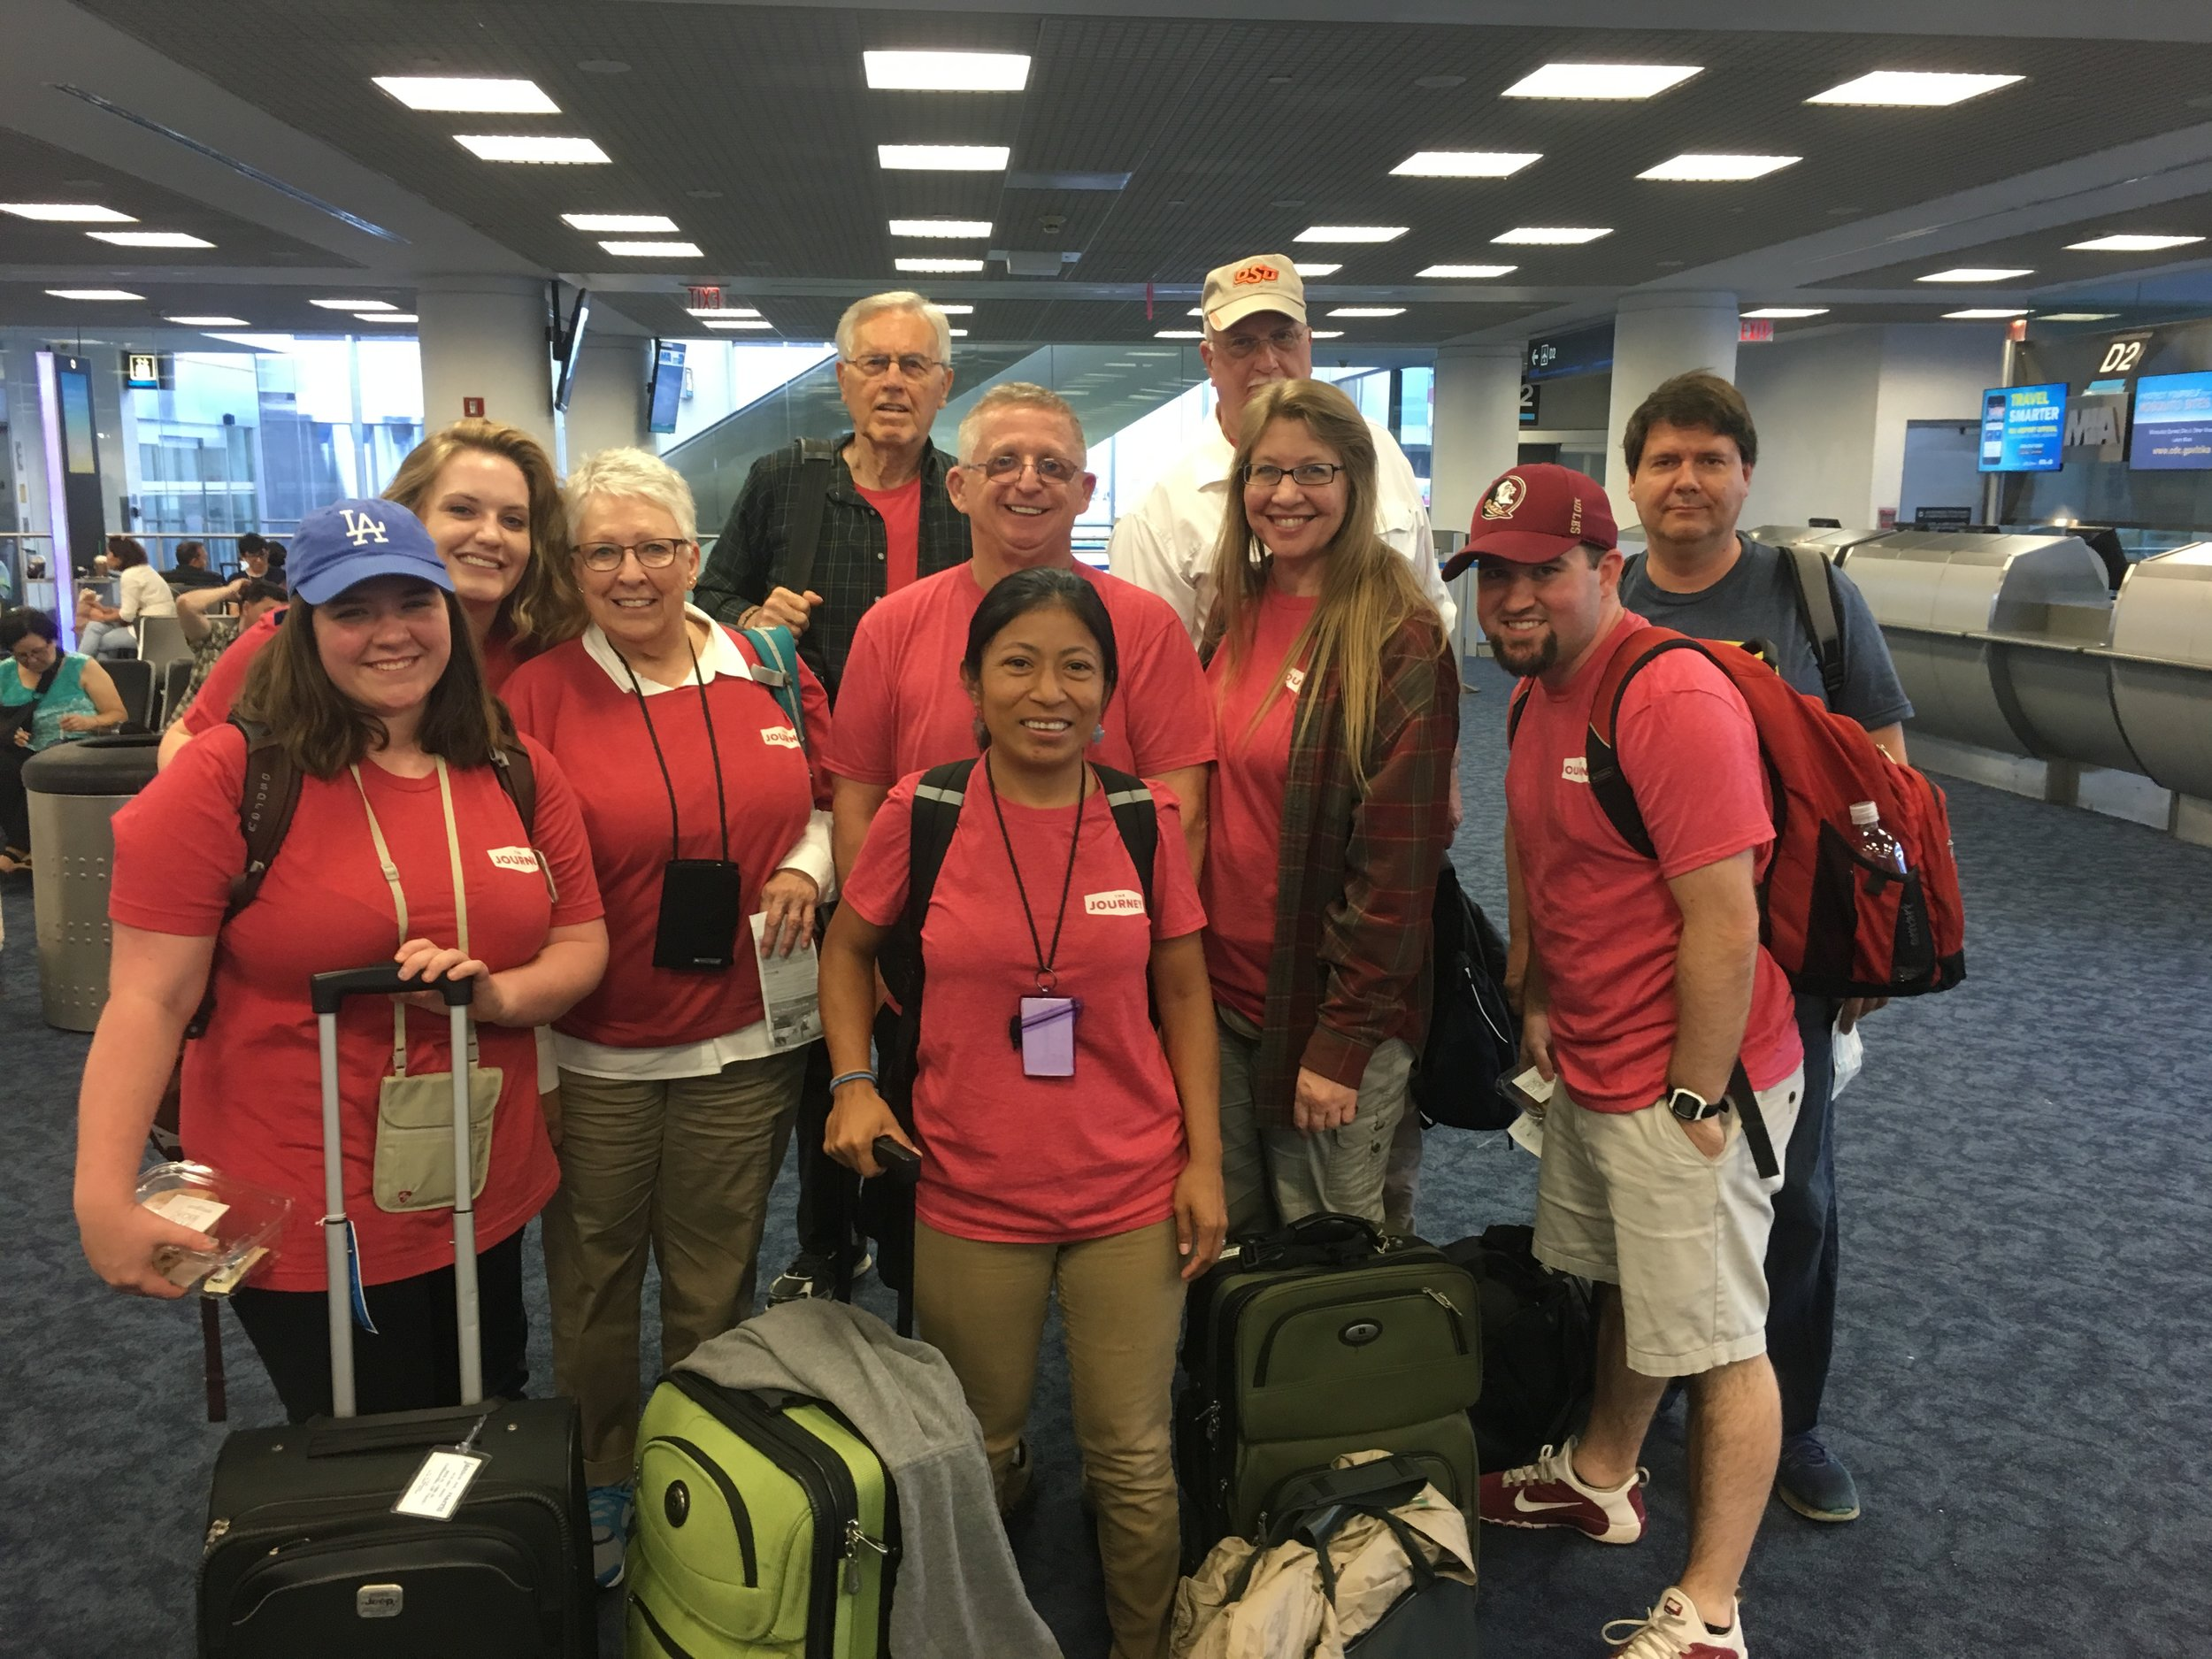 The Journey Team 2017